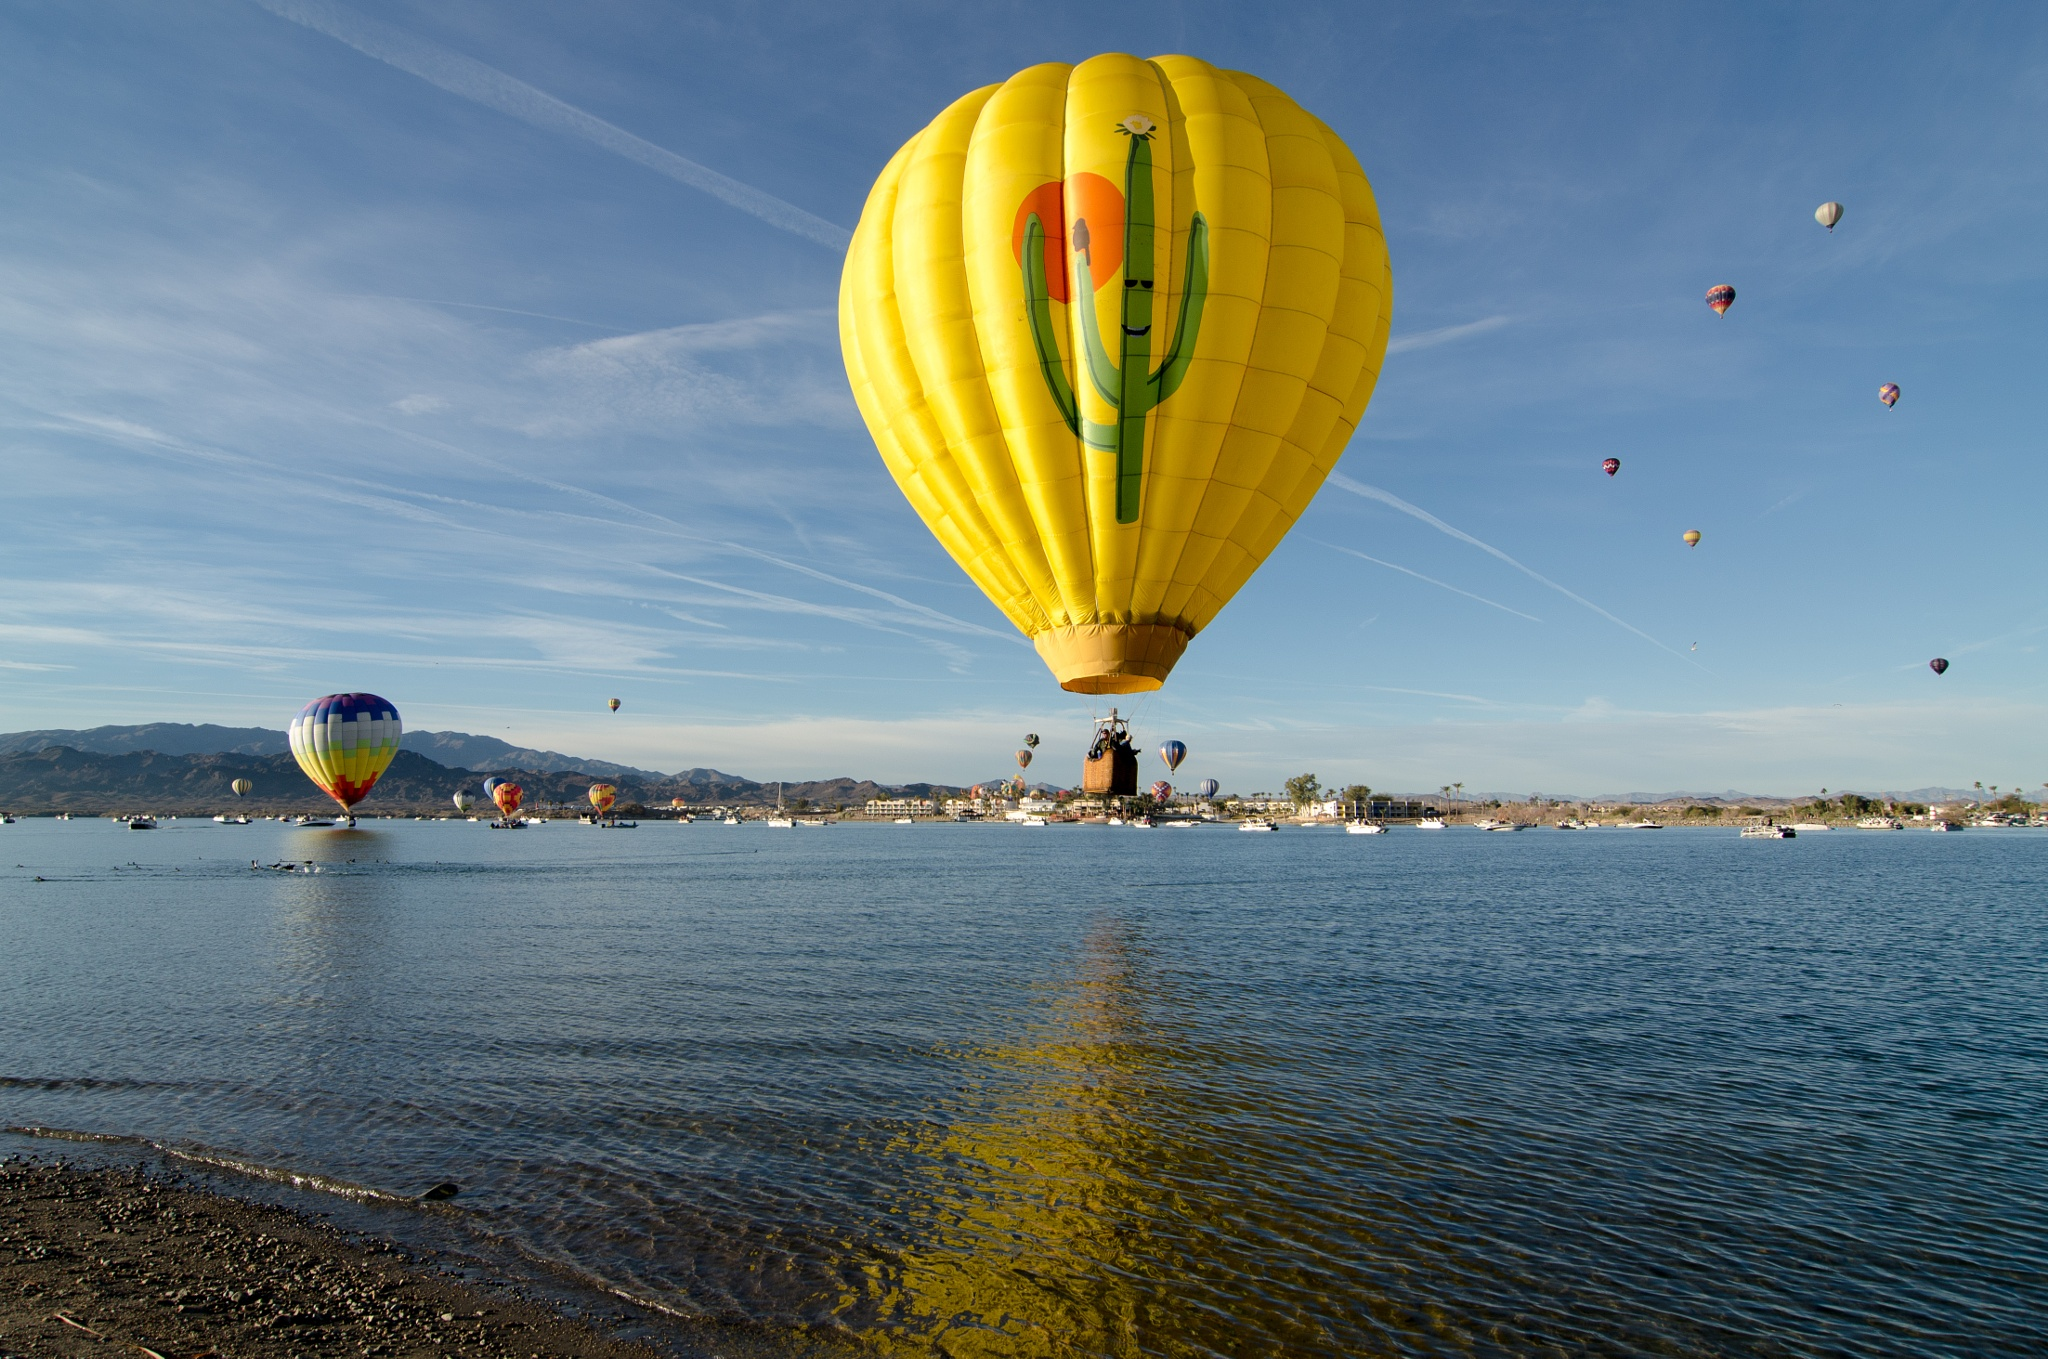 Yellow Balloon on Lake by Jeff Jones